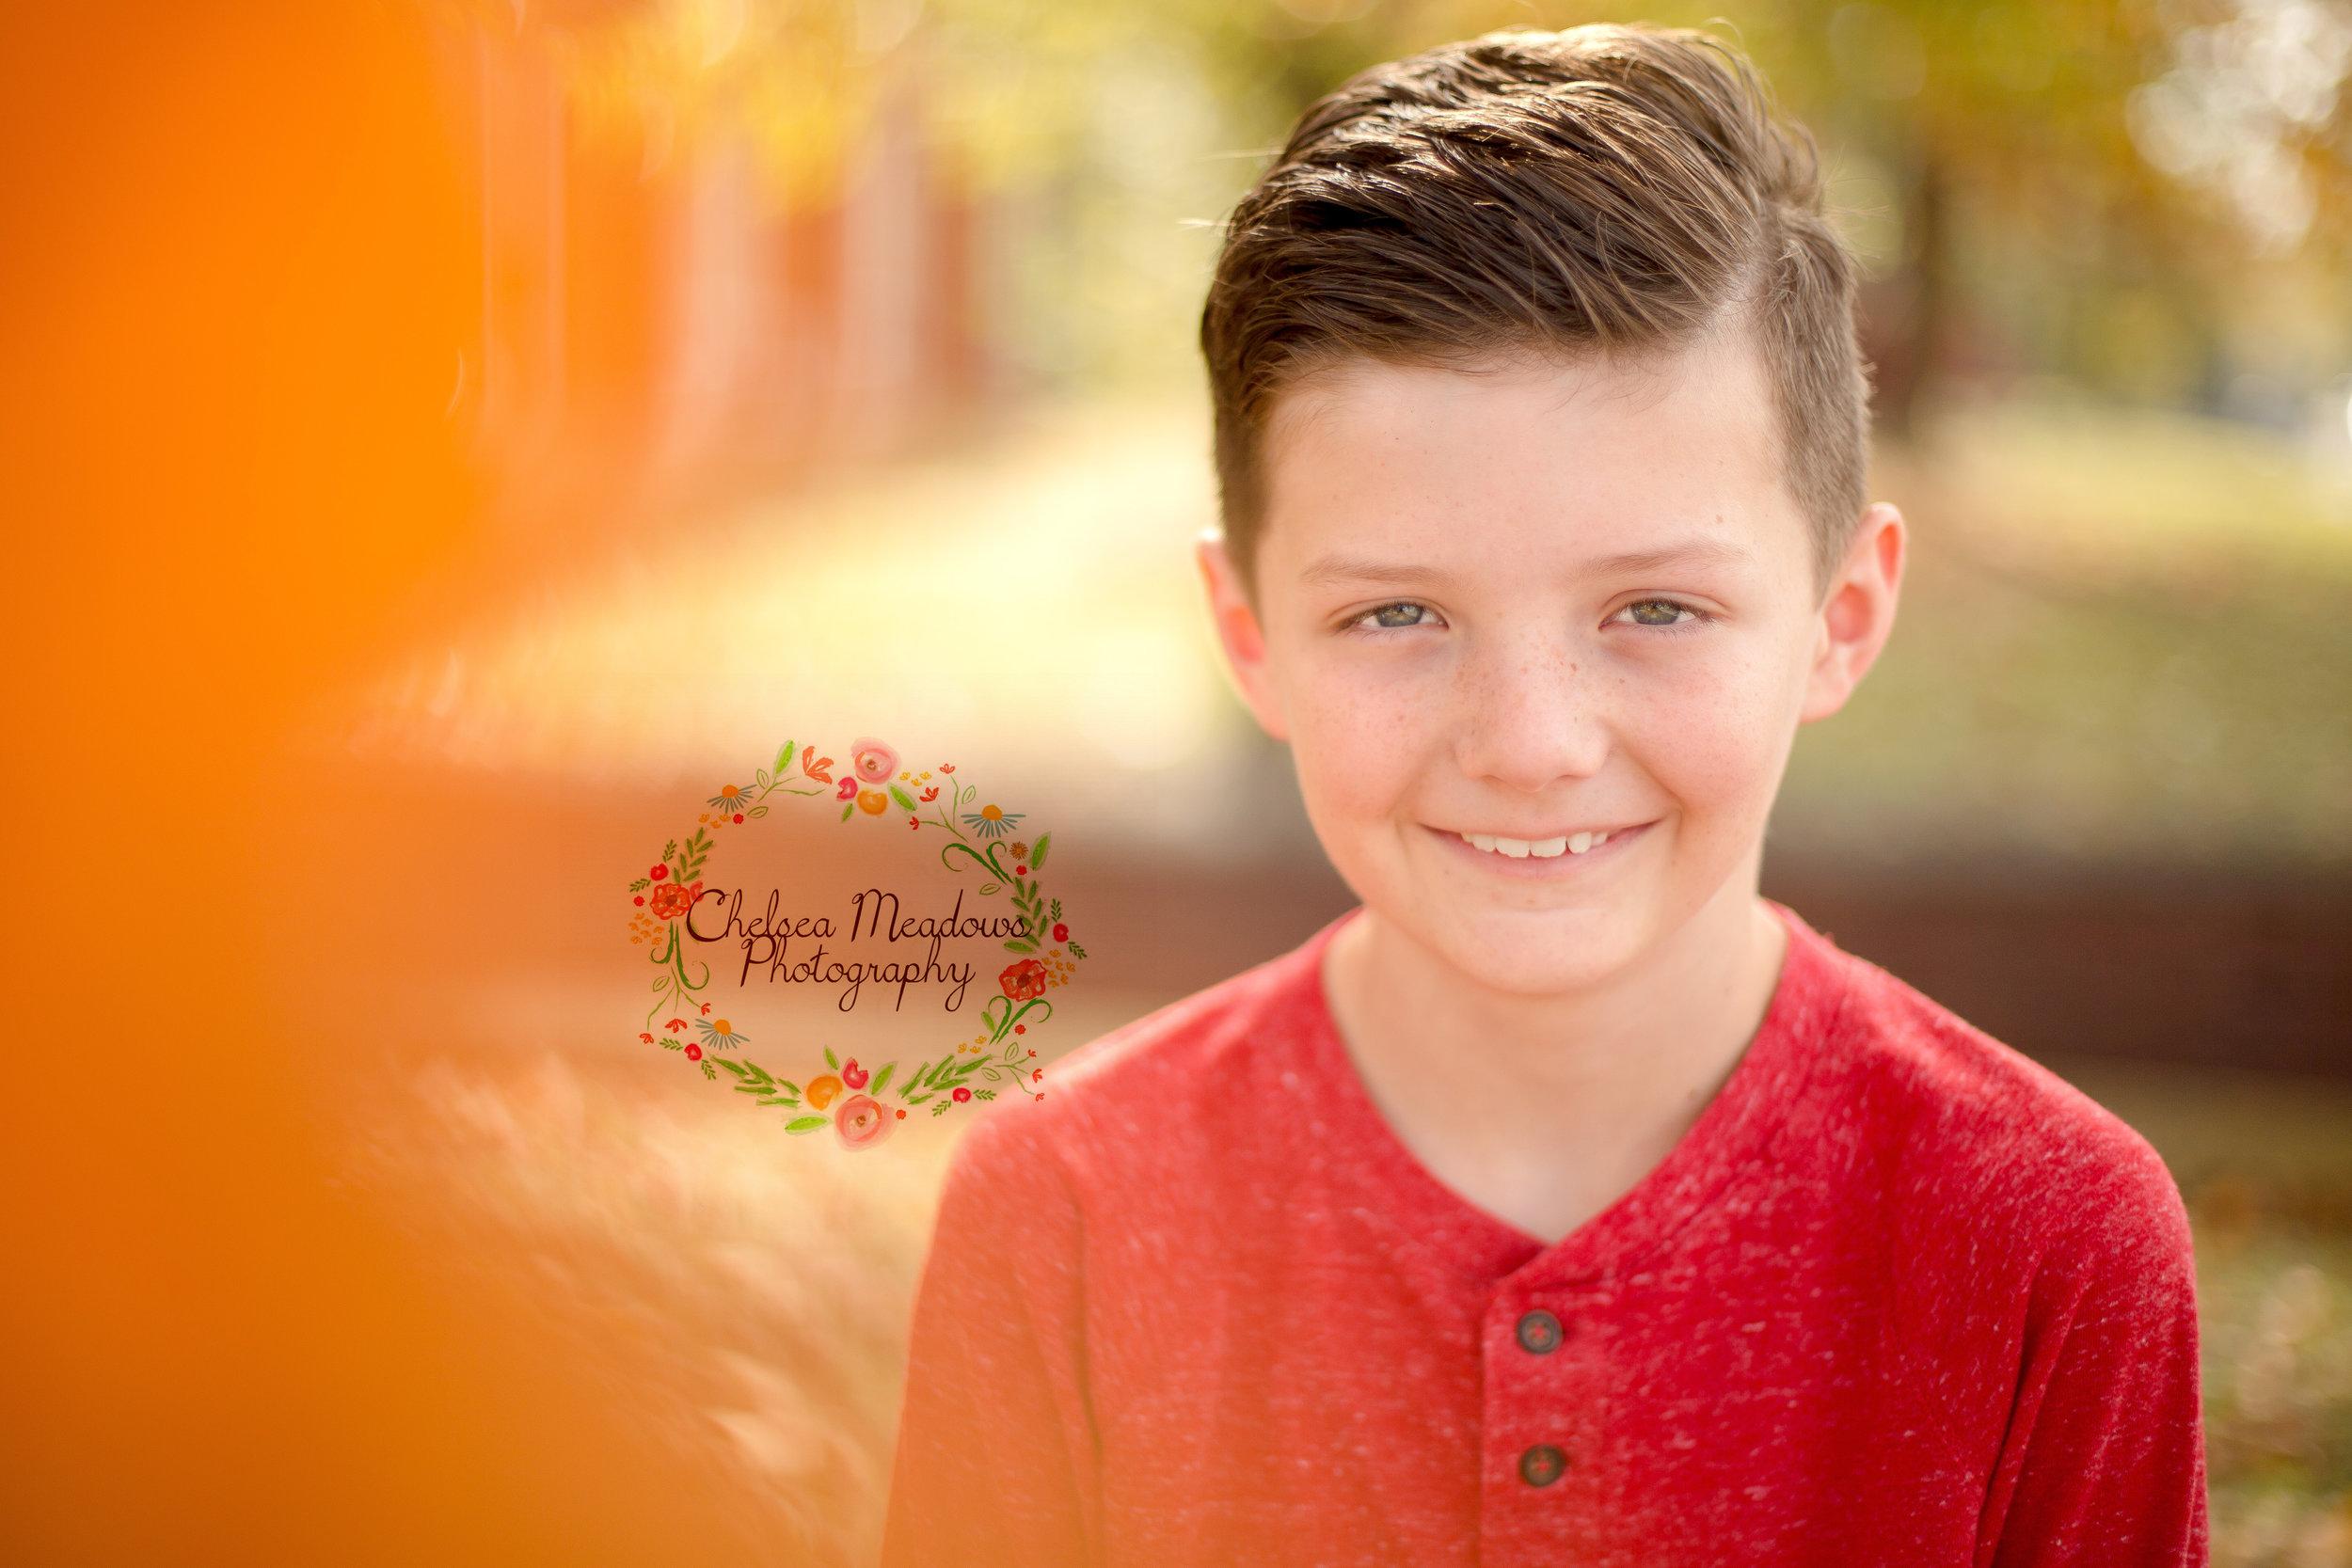 Shannon Family Session - Nashville Family Photographer - Chelsea Meadows Photography (5).jpg